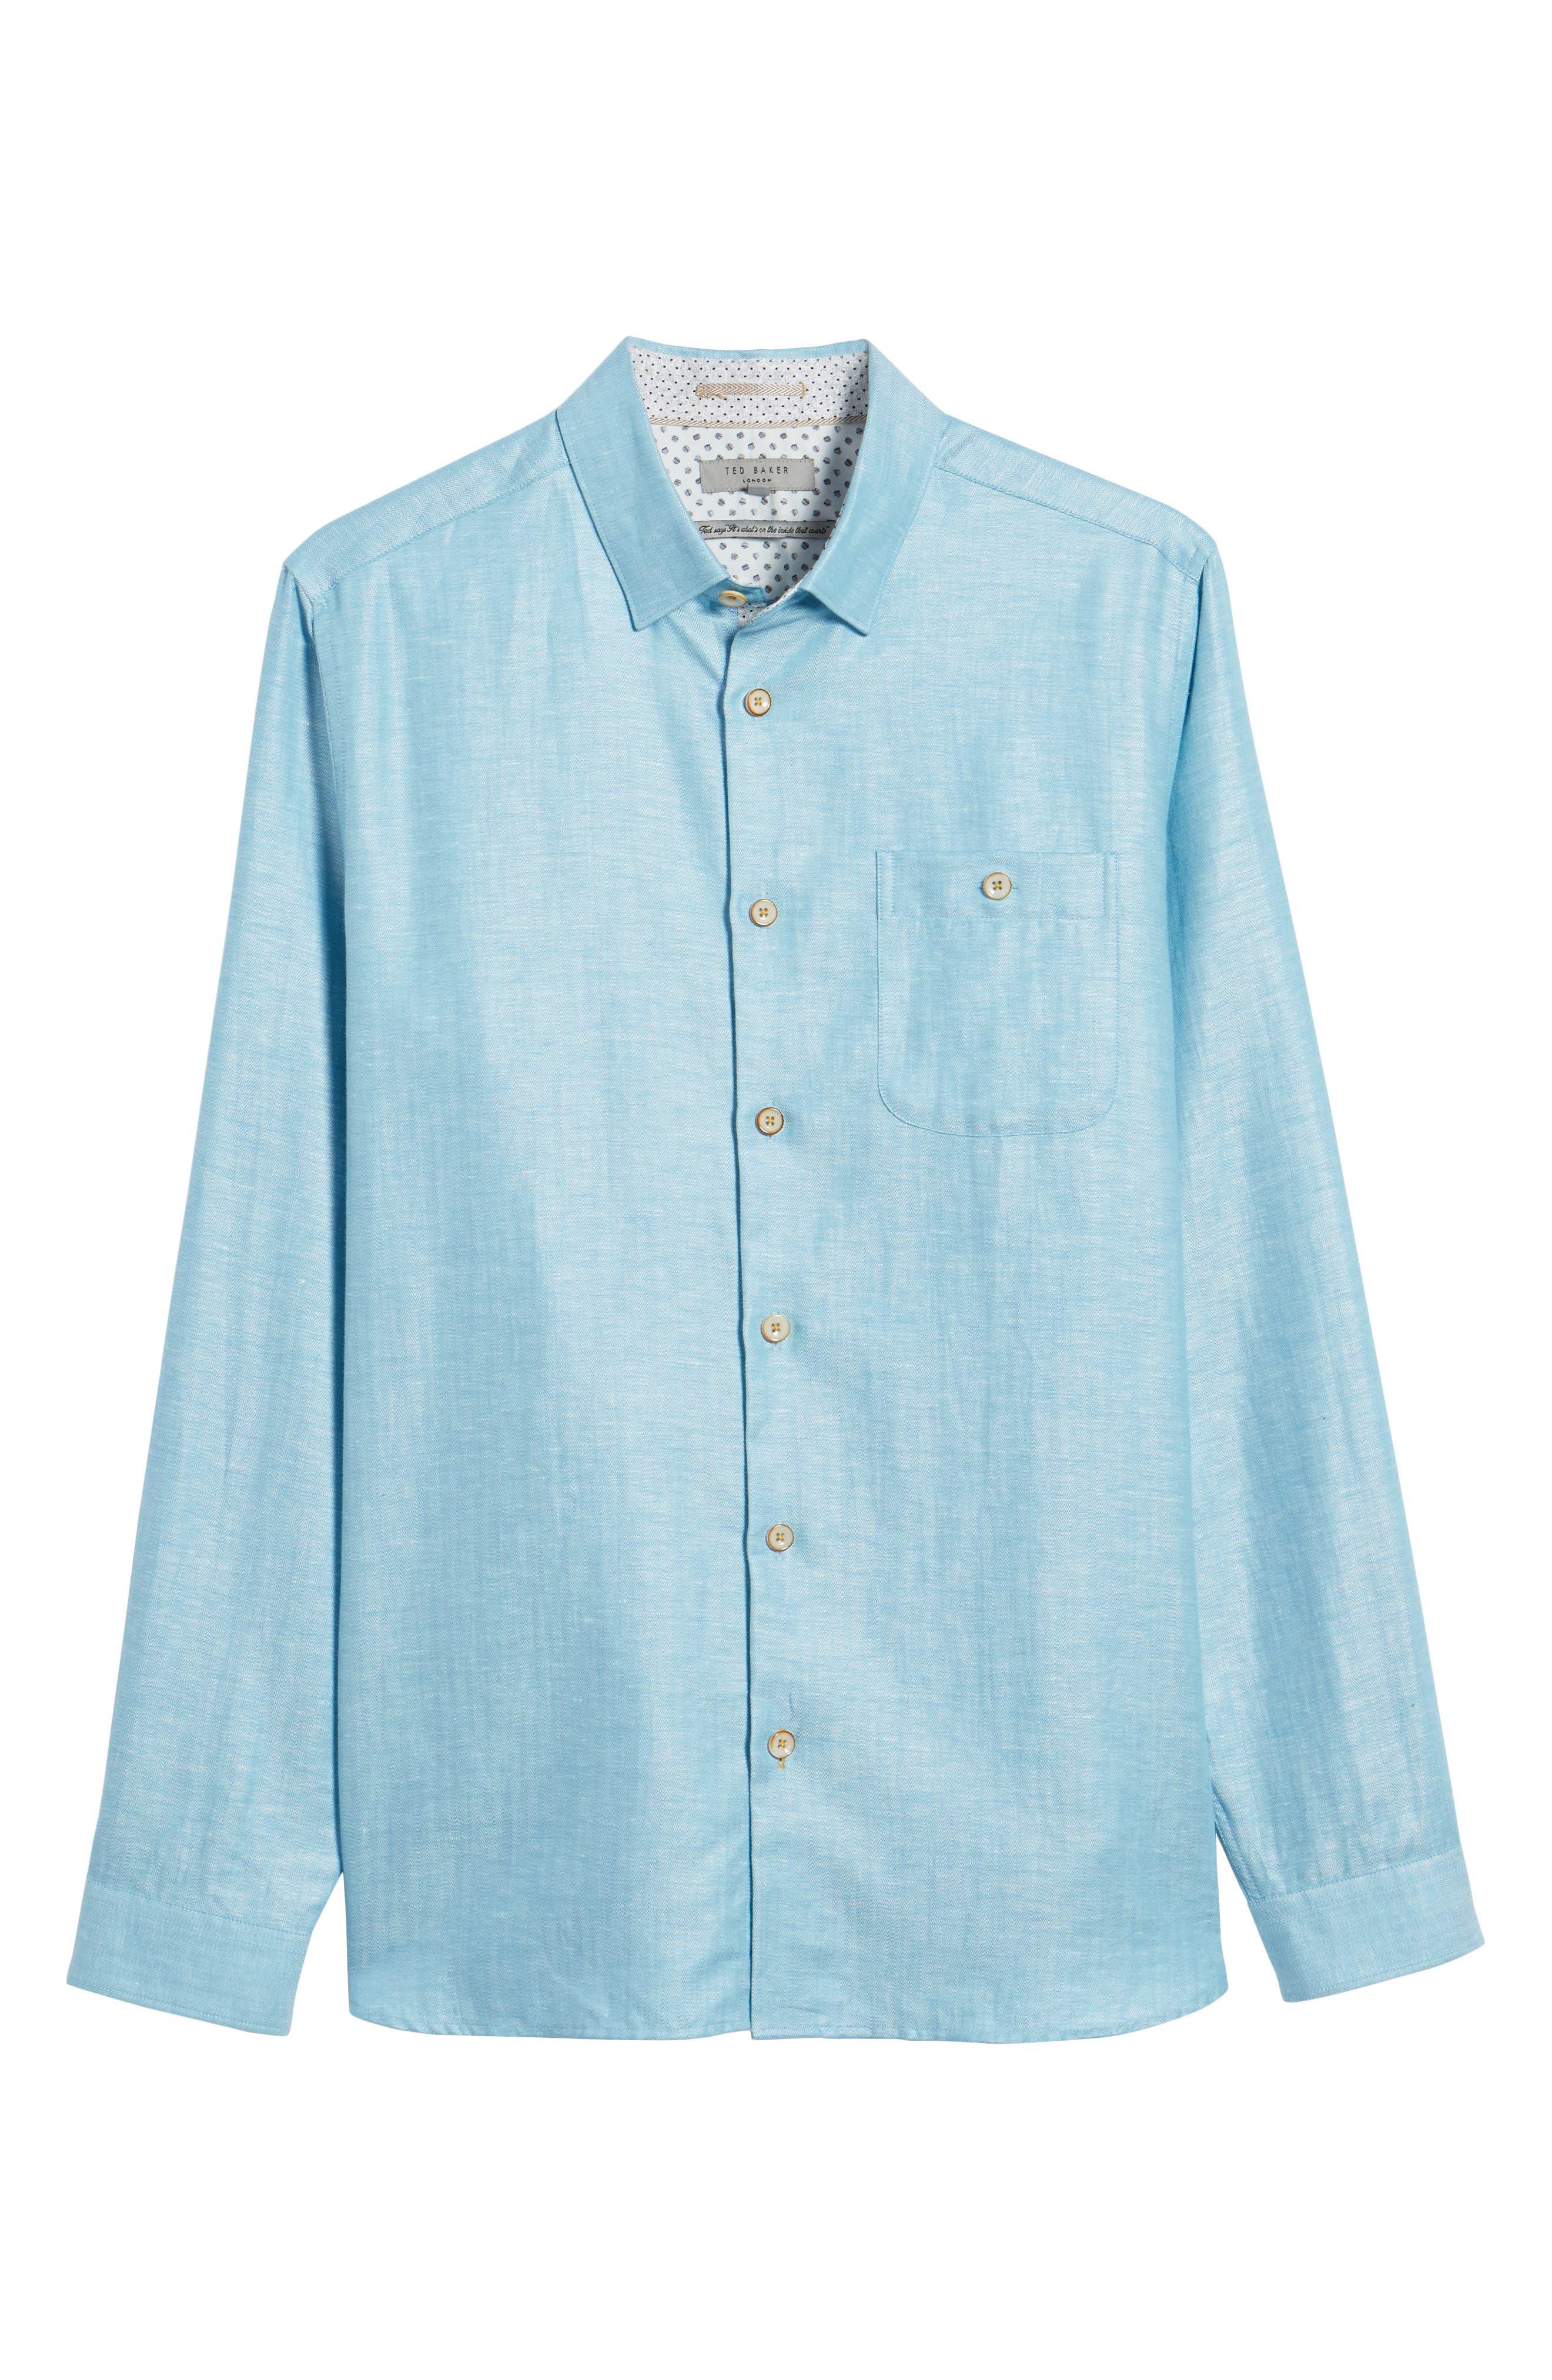 Linlins Herringbone Cotton & Linen Sport Shirt,                             Alternate thumbnail 24, color,